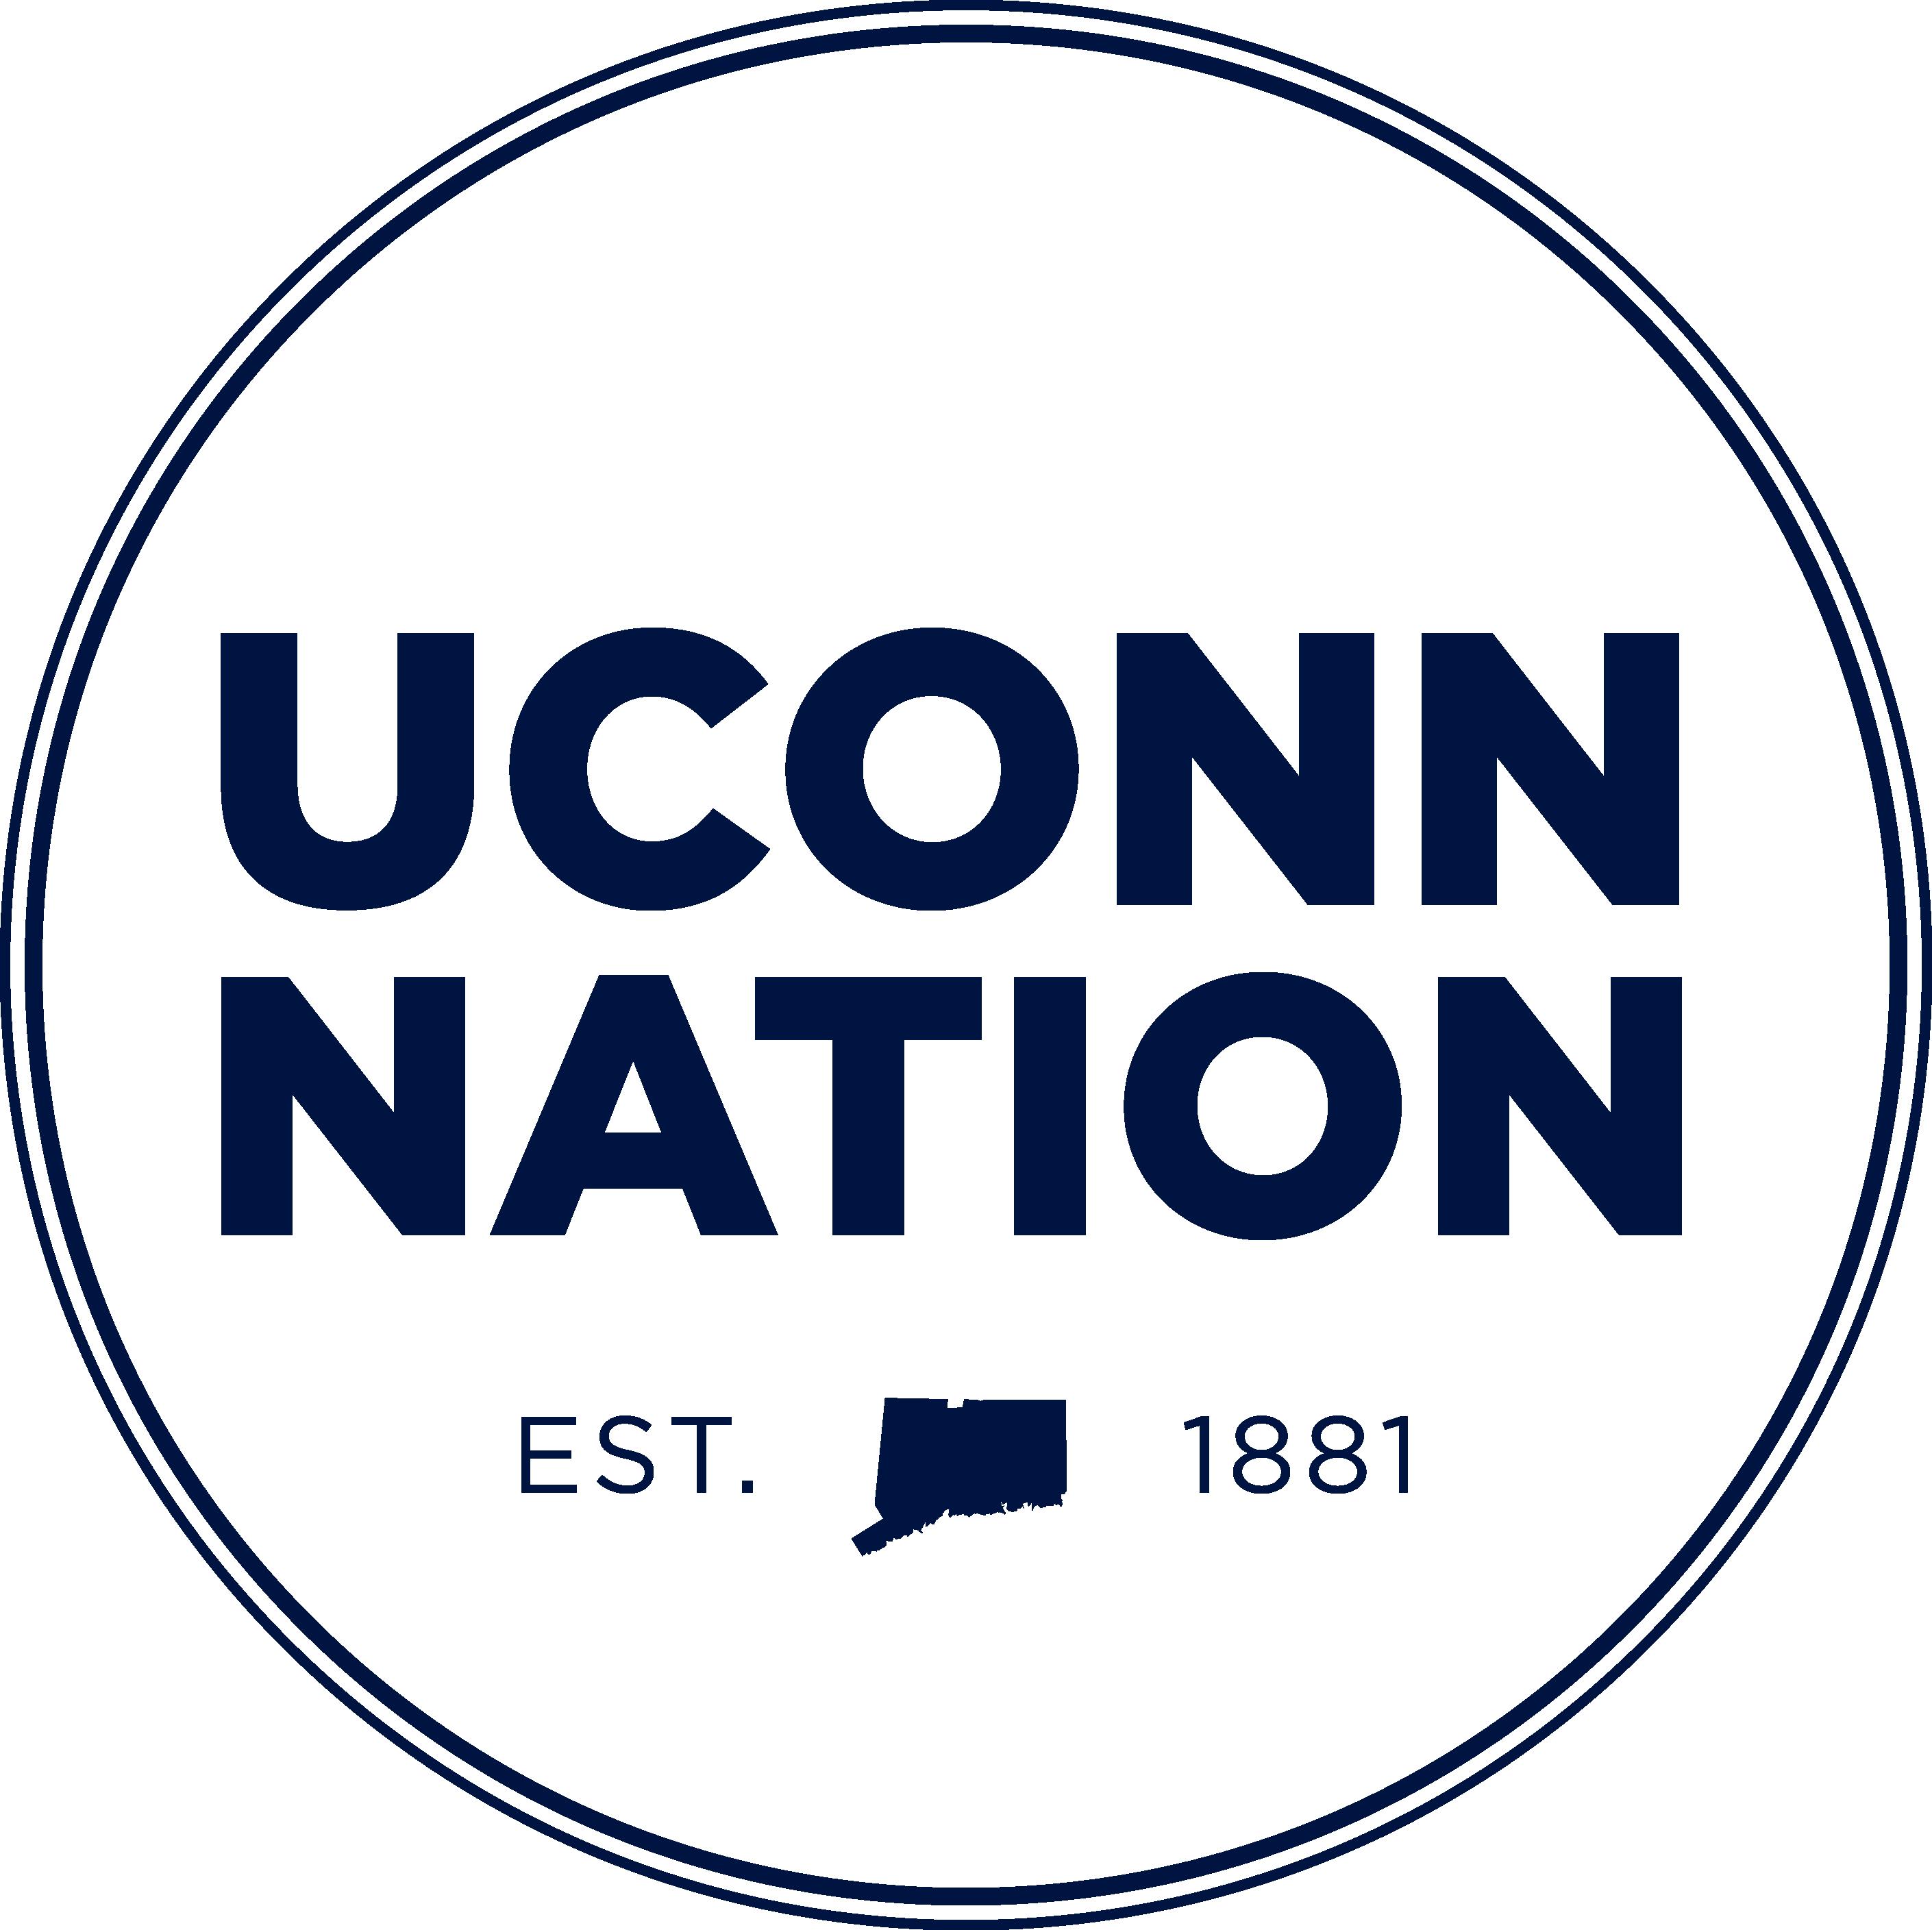 UConn Nation